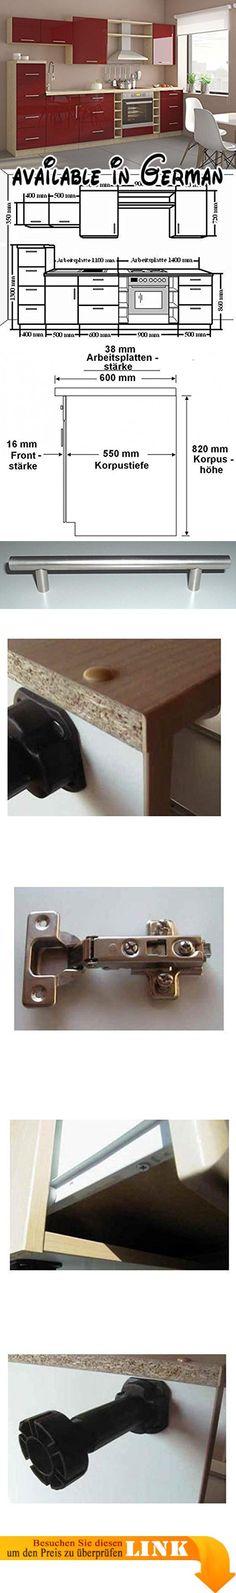 B078V2BGCT  Küche Regal Mikrowelle Ofen Rack Ofen Doppelschicht